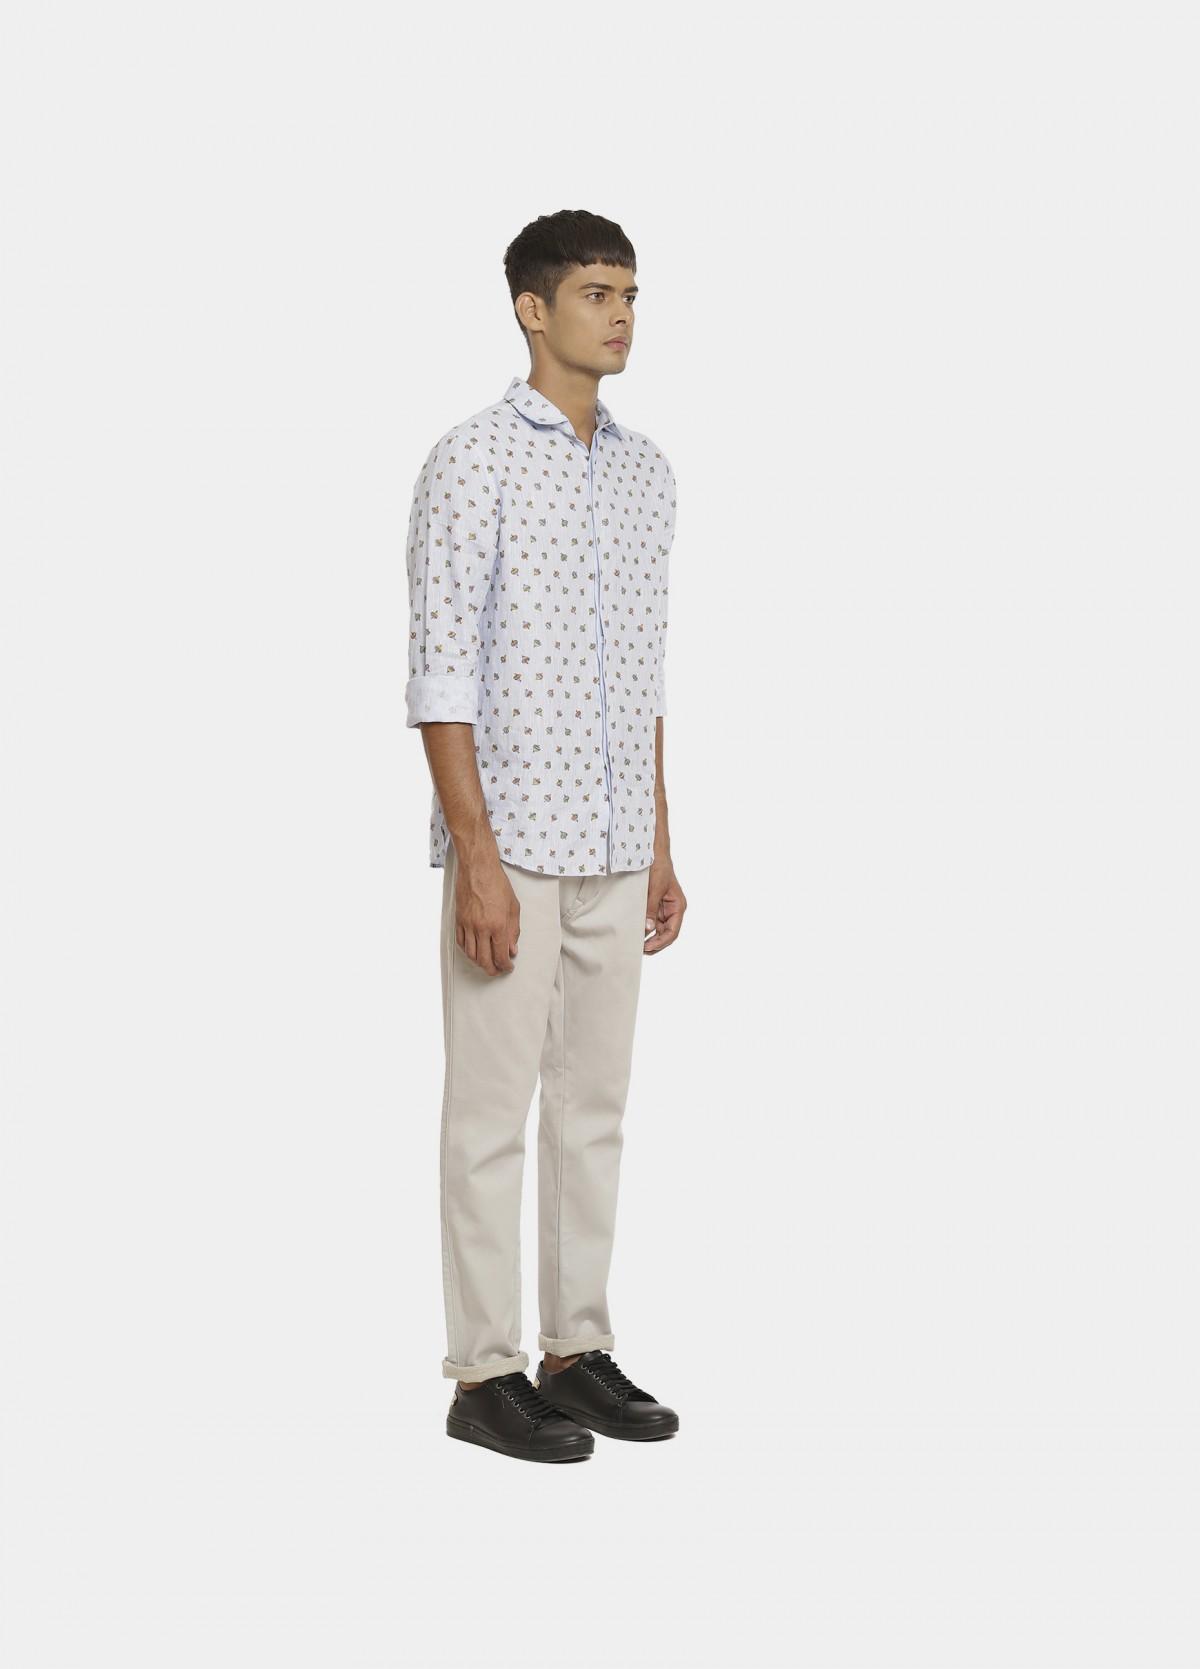 The Lattu Shirt